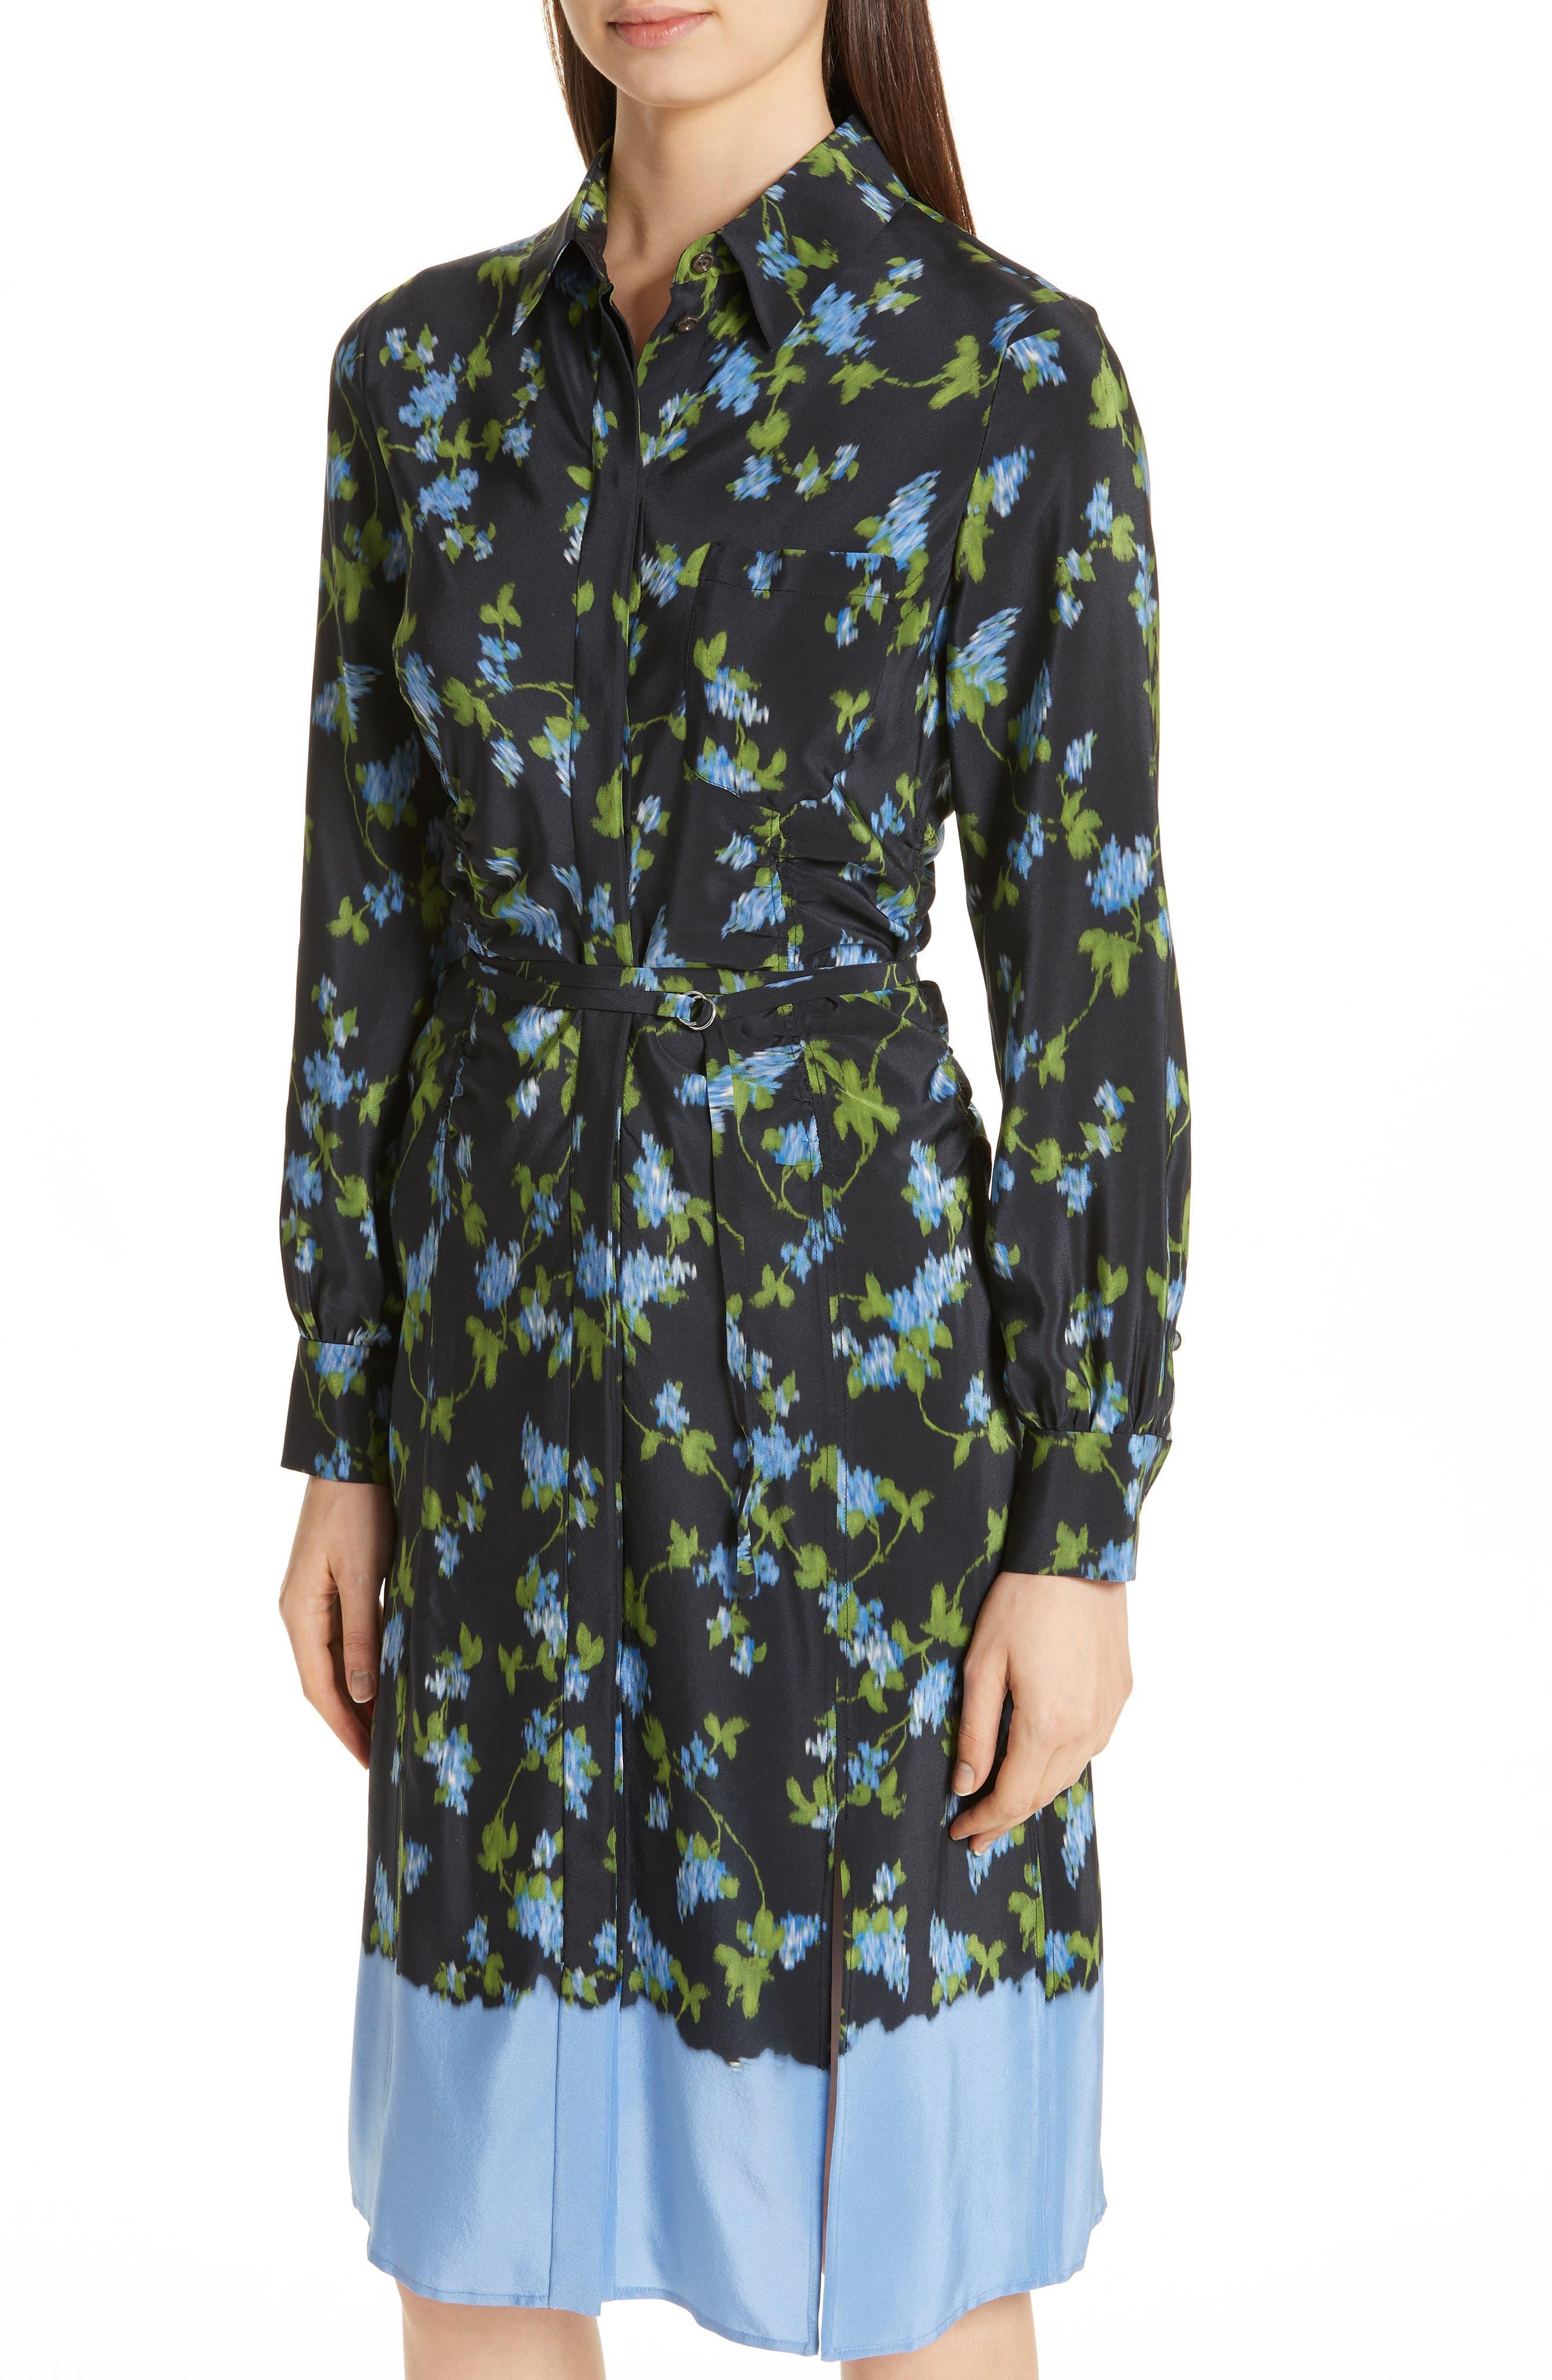 ALTUZARRA, Floral Print Silk Dress, Alternate thumbnail 5, color, BLACK